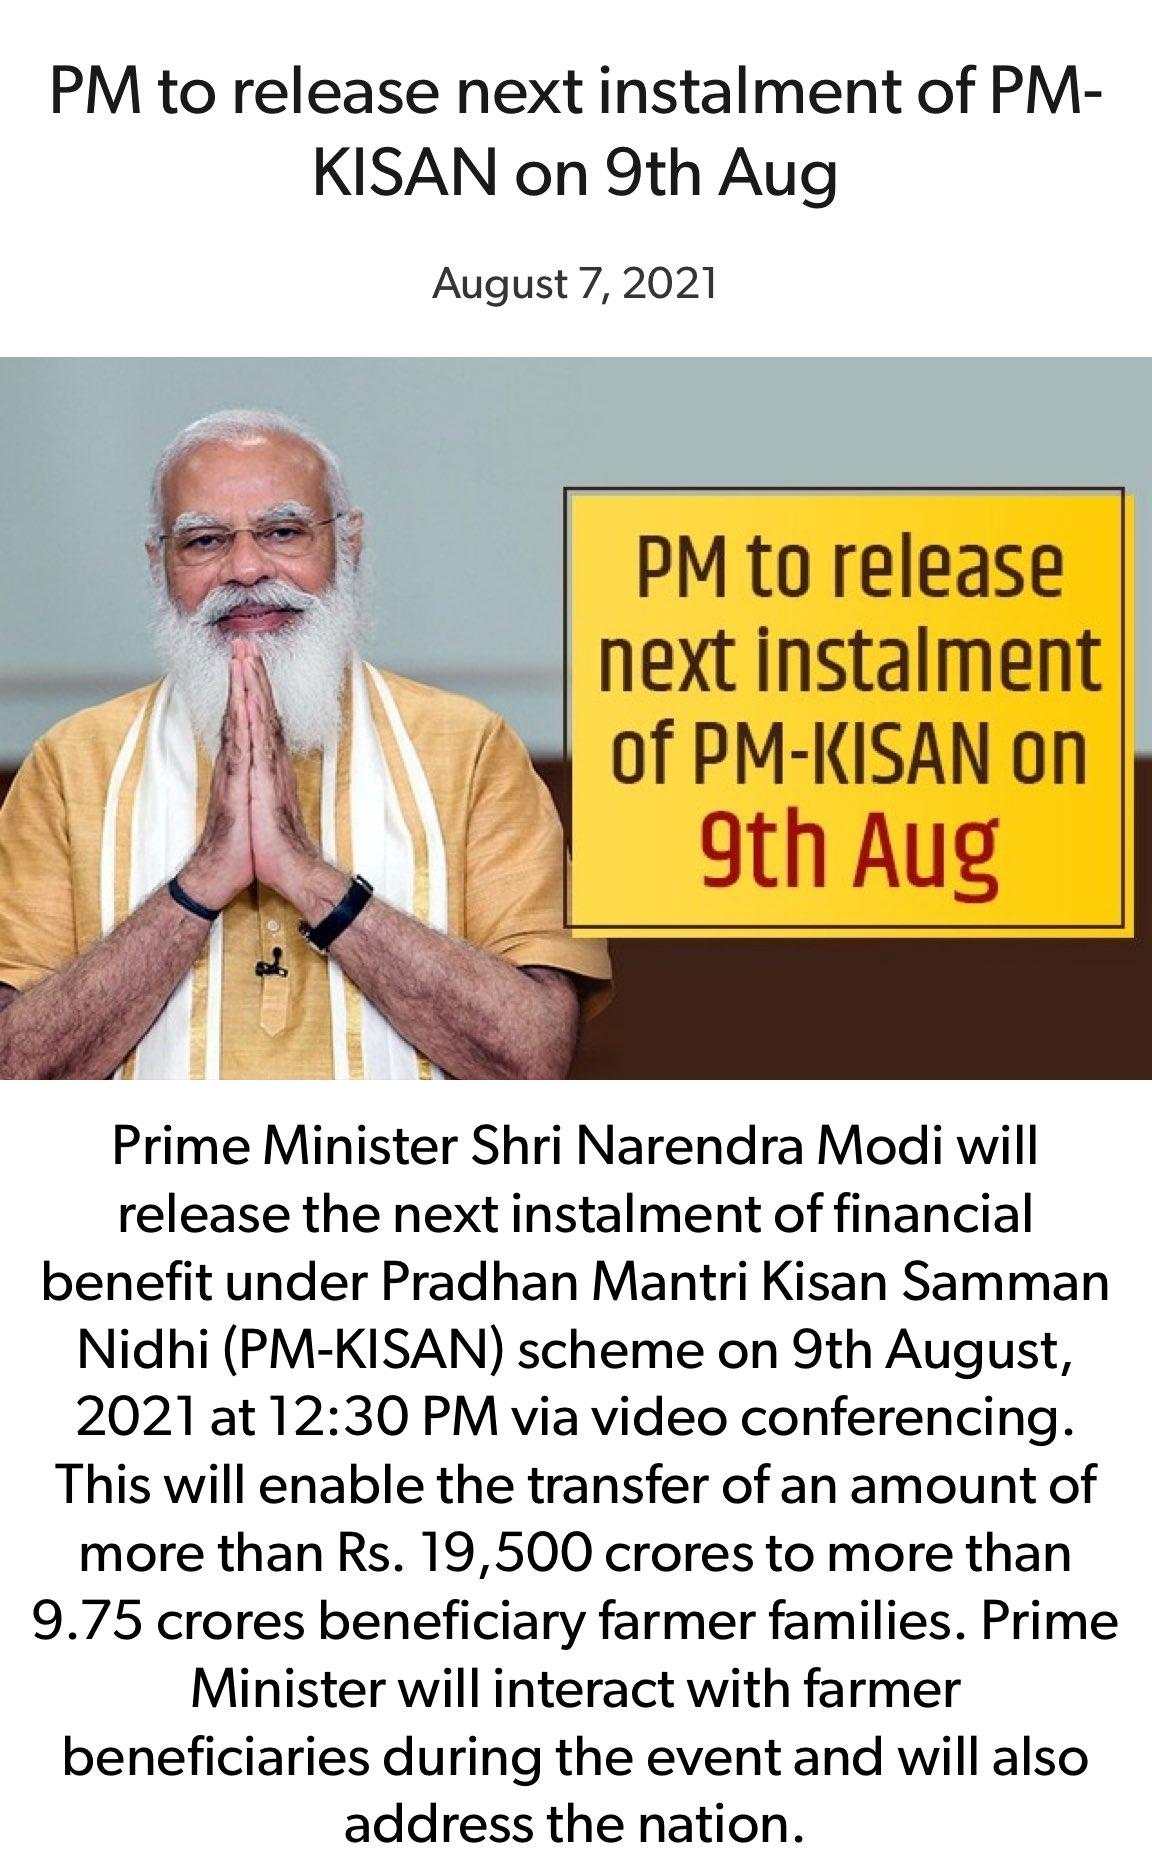 PM Modi to release next instalment of PM-KISAN on 9th Aug.  https://t.co/ocpHm21GeA  via NaMo App